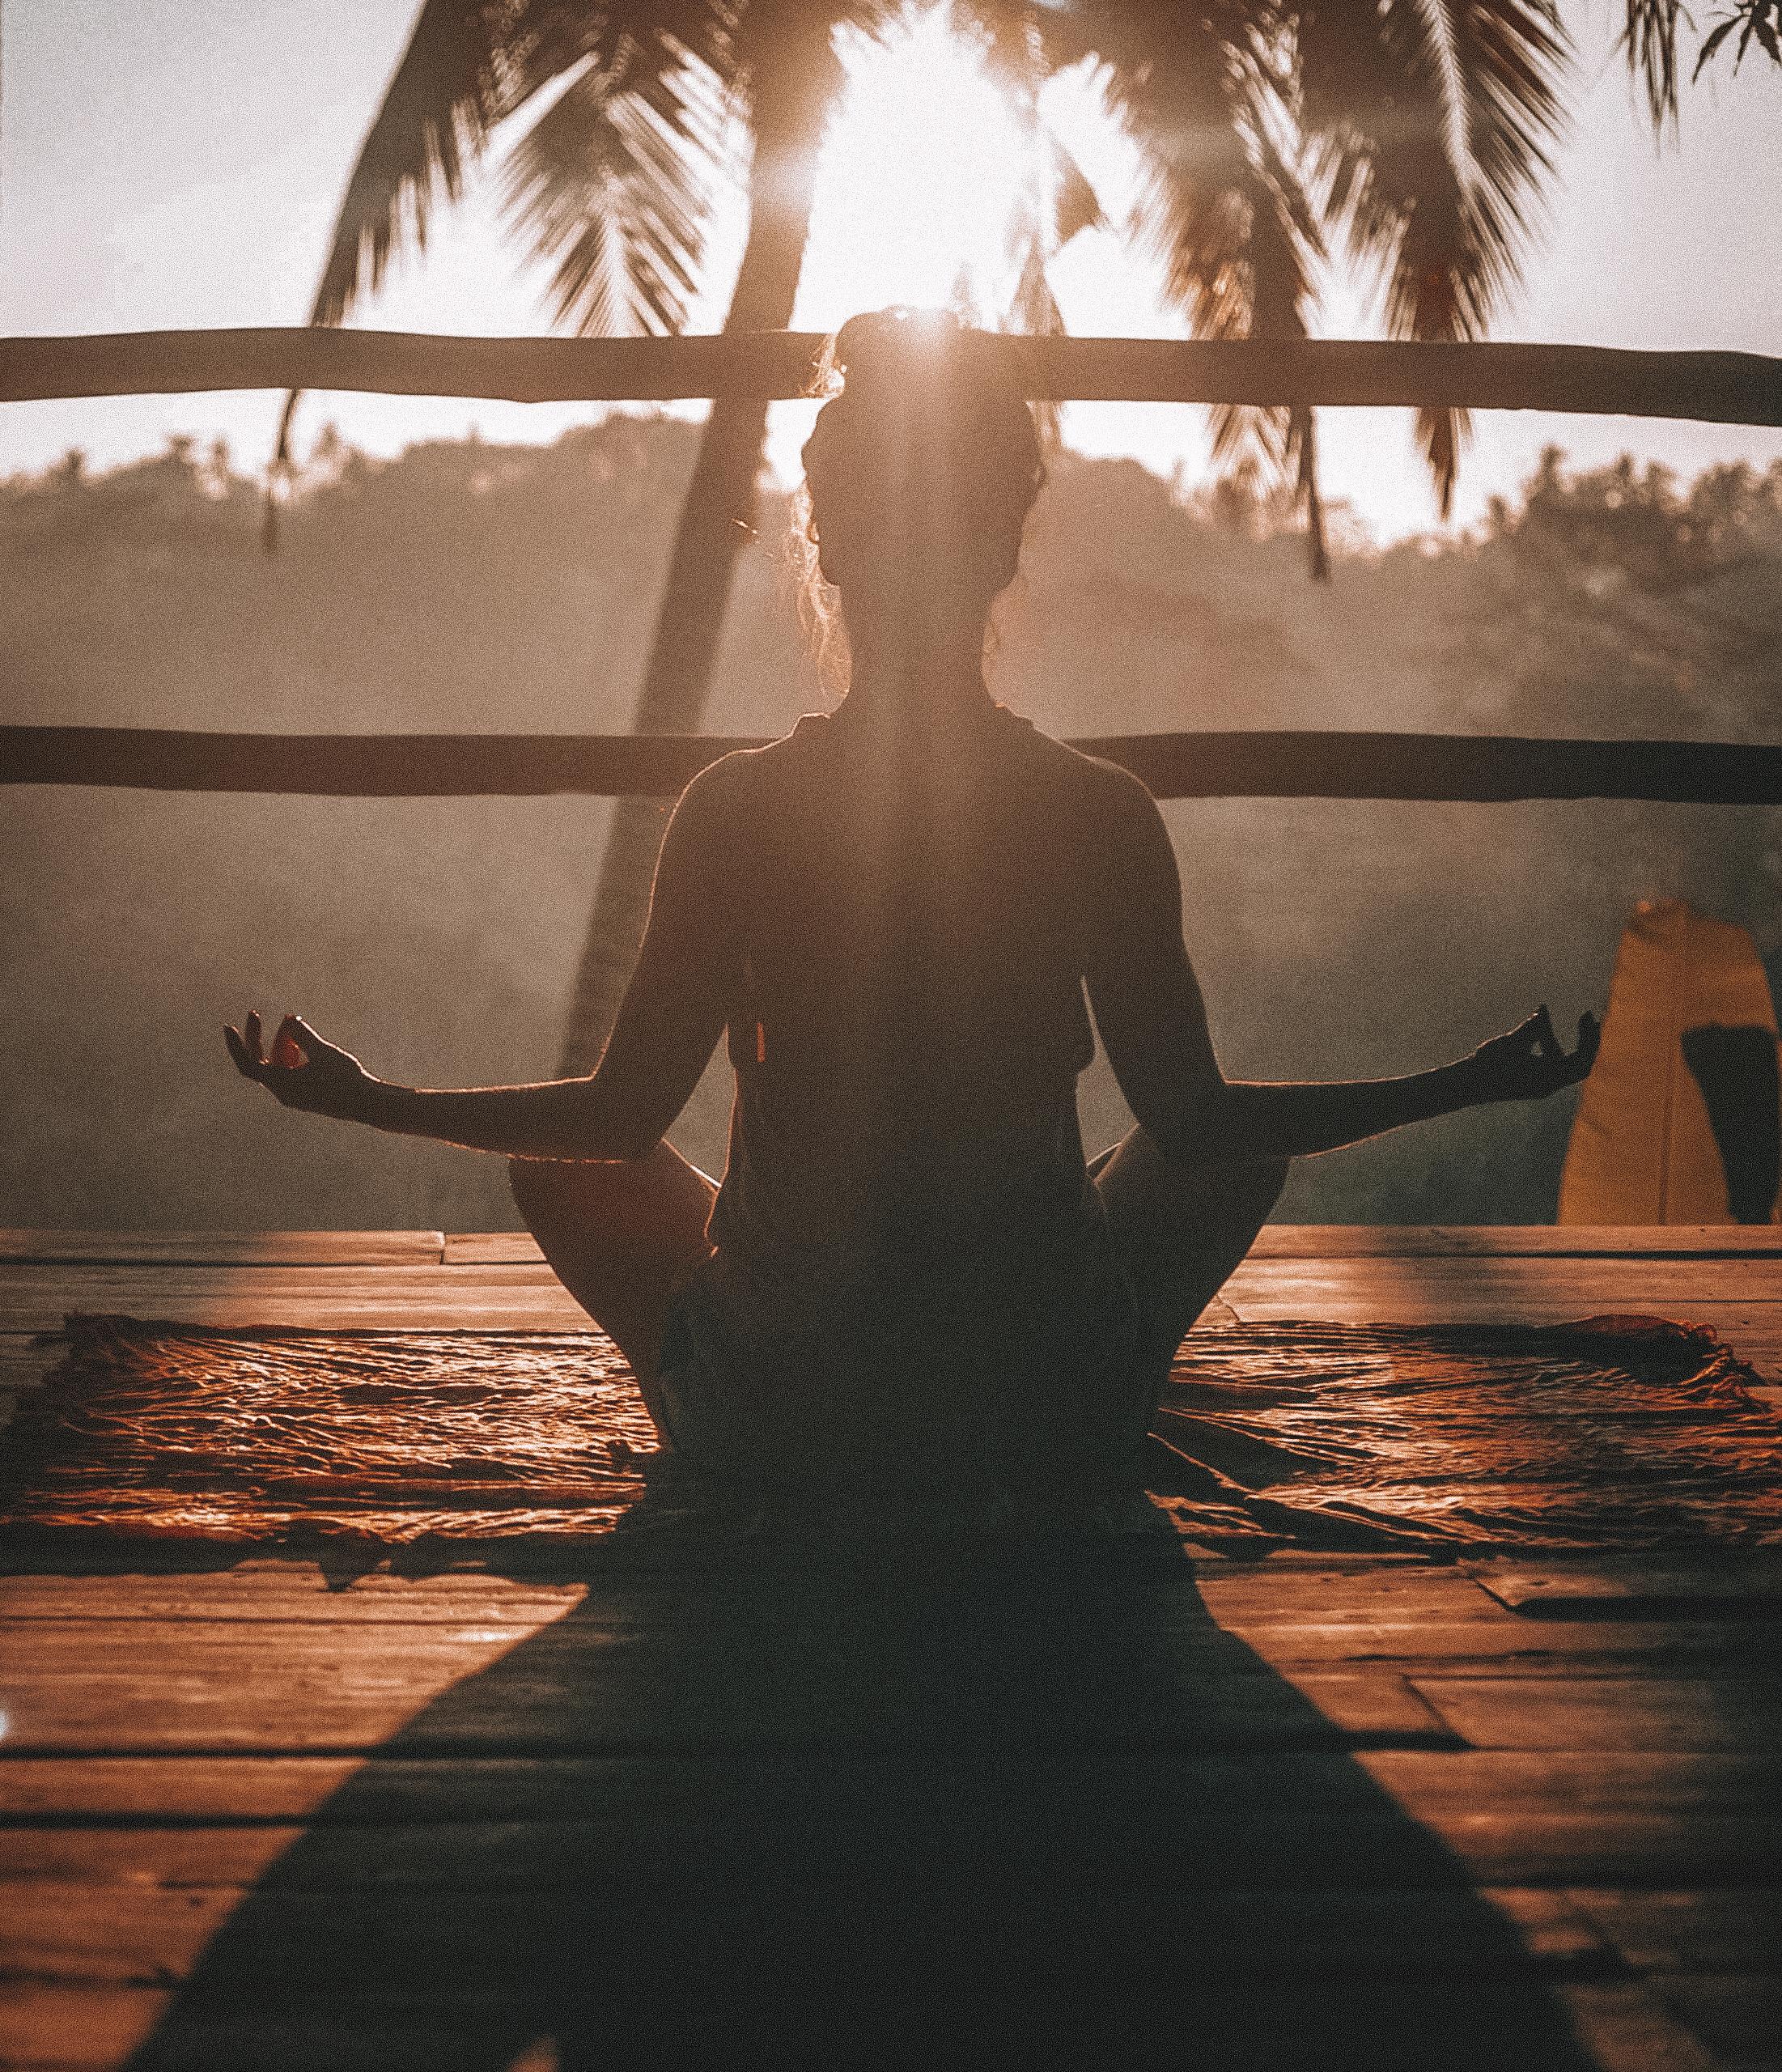 yoga-woman-on-the-beach-thumb18434664.jpg